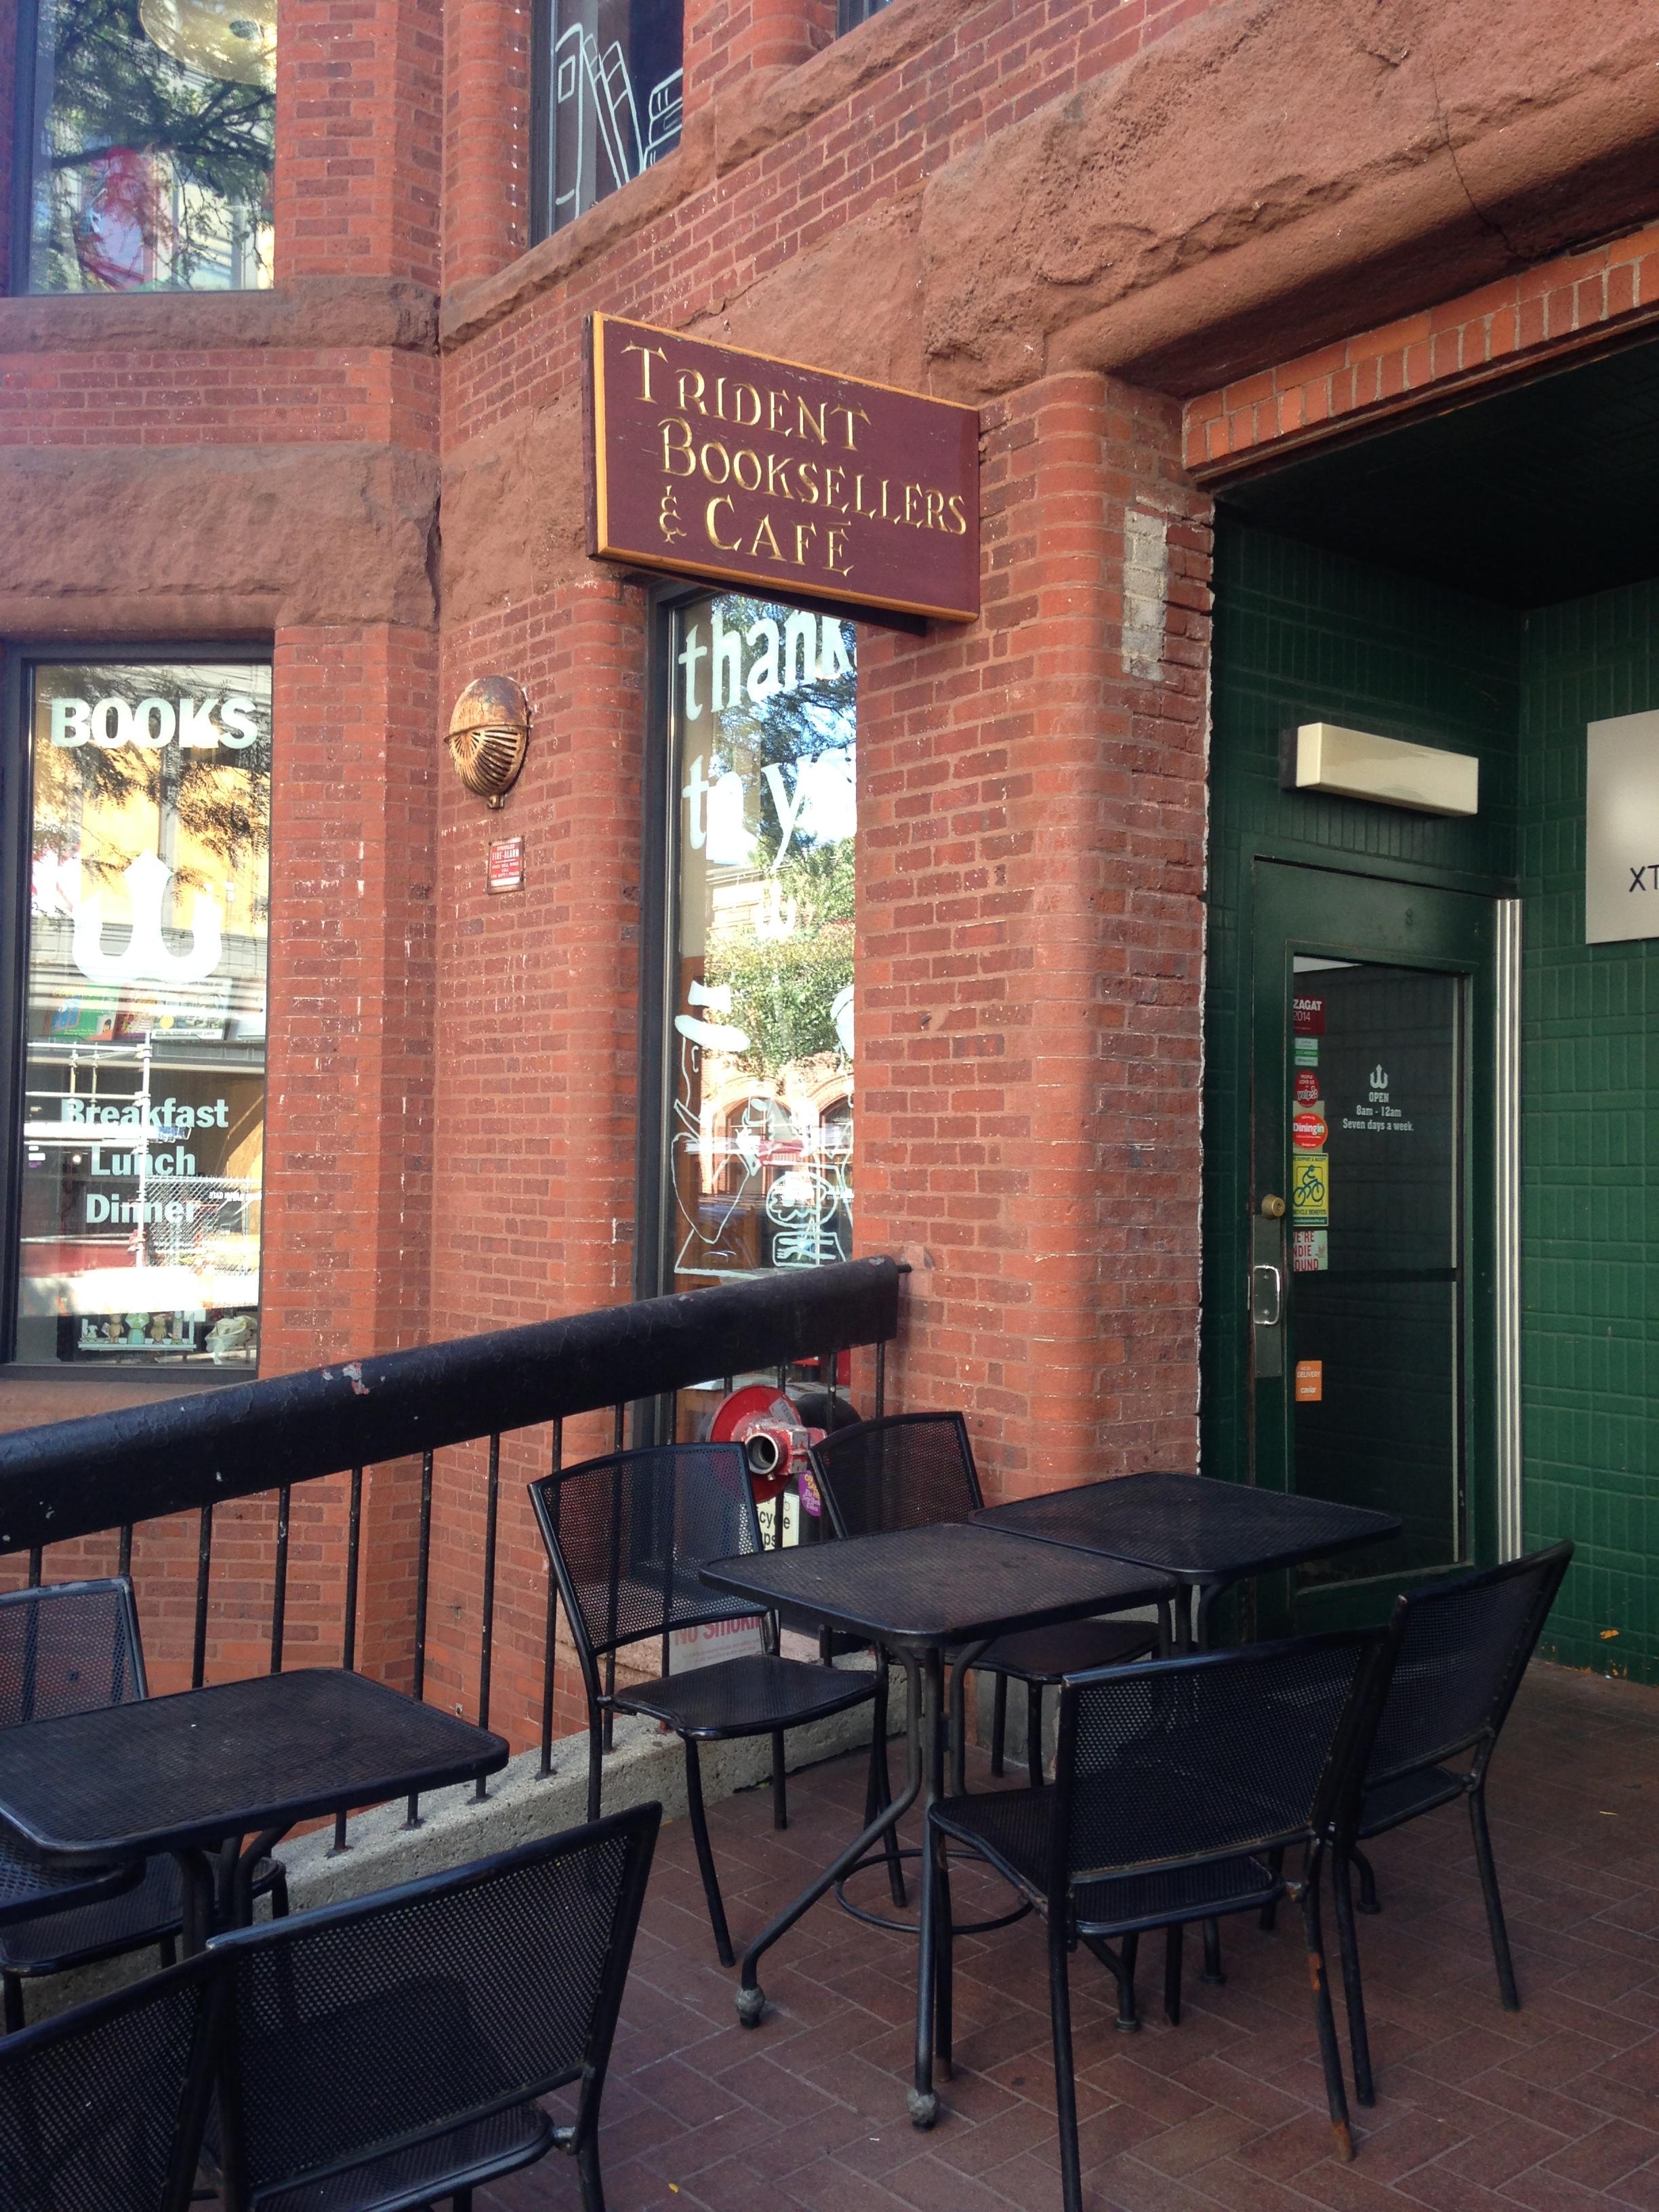 Trident Bookstore and Café